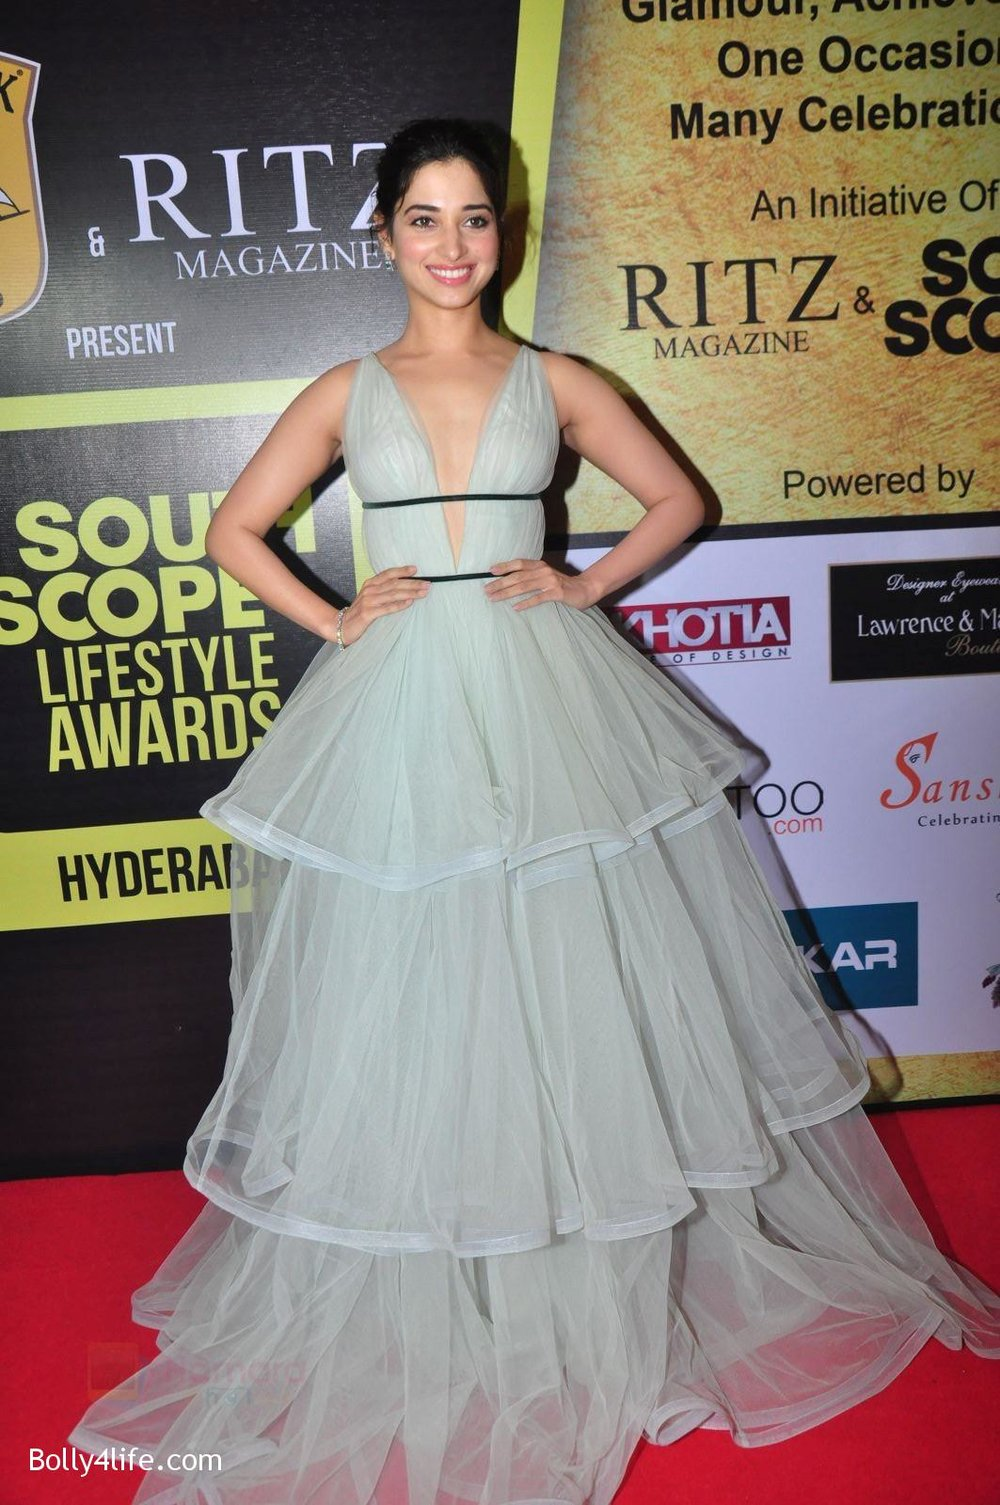 Tamannah-Bhatia-at-South-Scope-Lifestyle-Awards-5.jpg